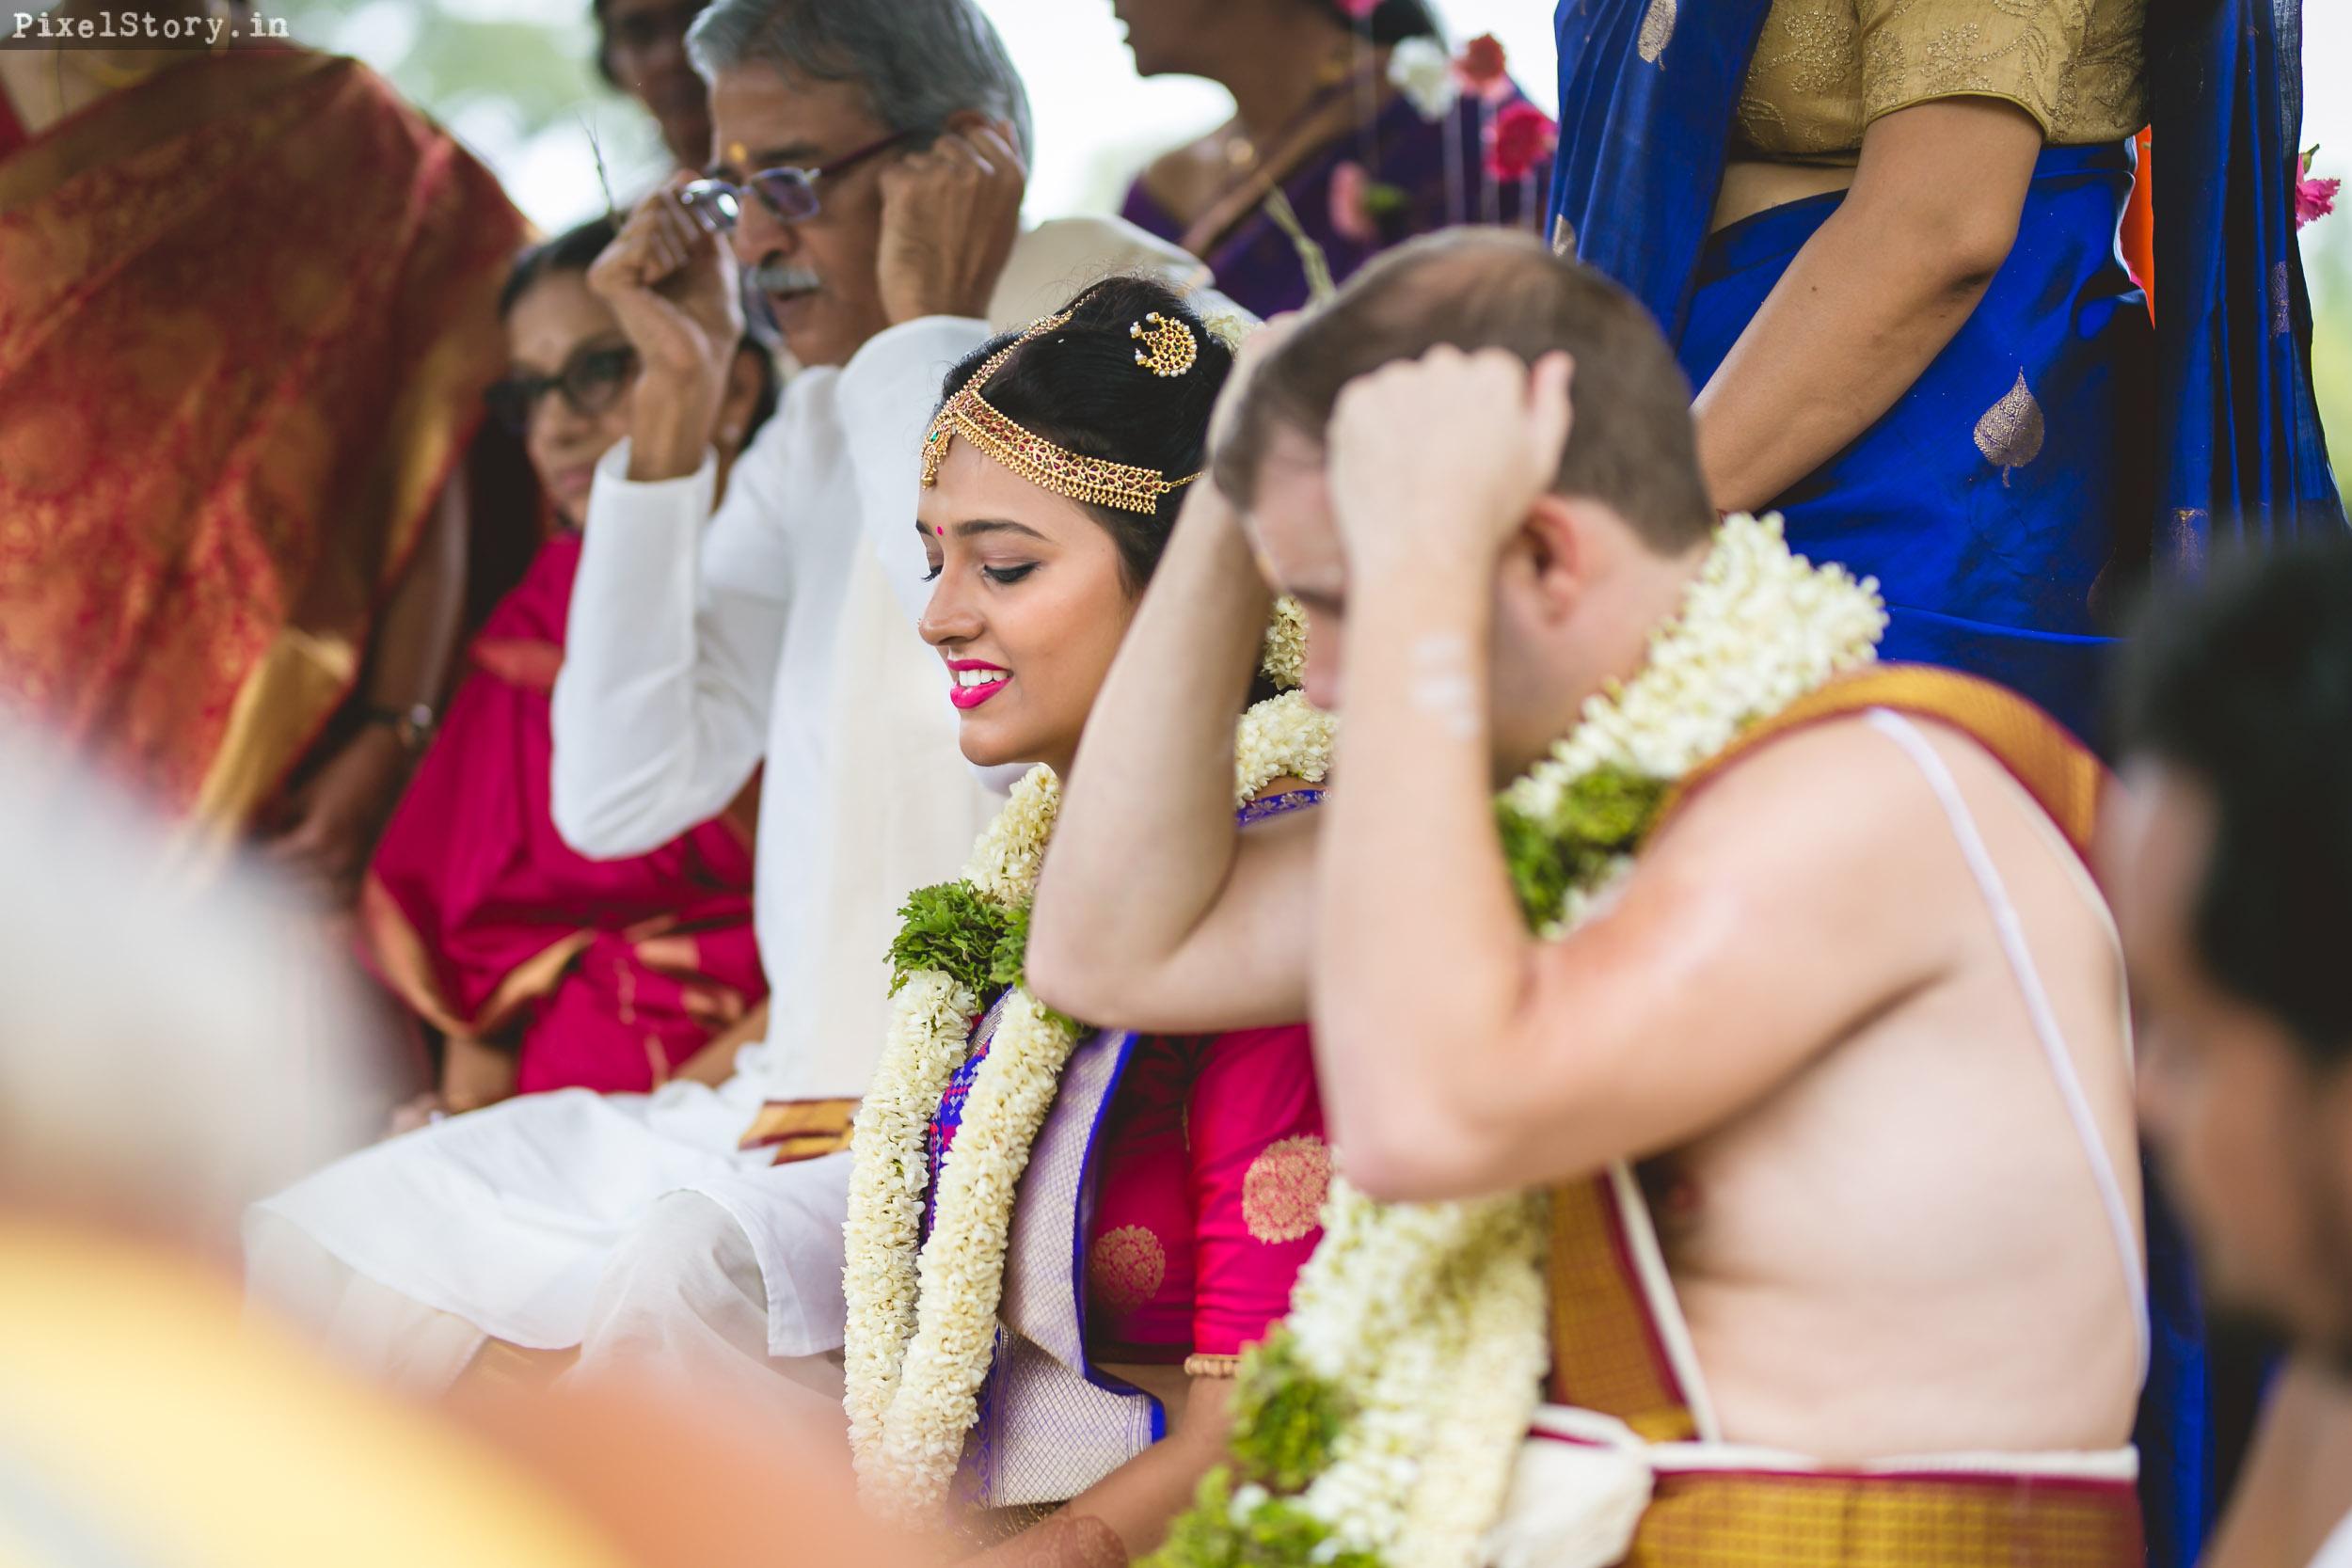 PixelStory-Jungle-Wedding-Photographer-Masinagudi-Indo-French050.jpg